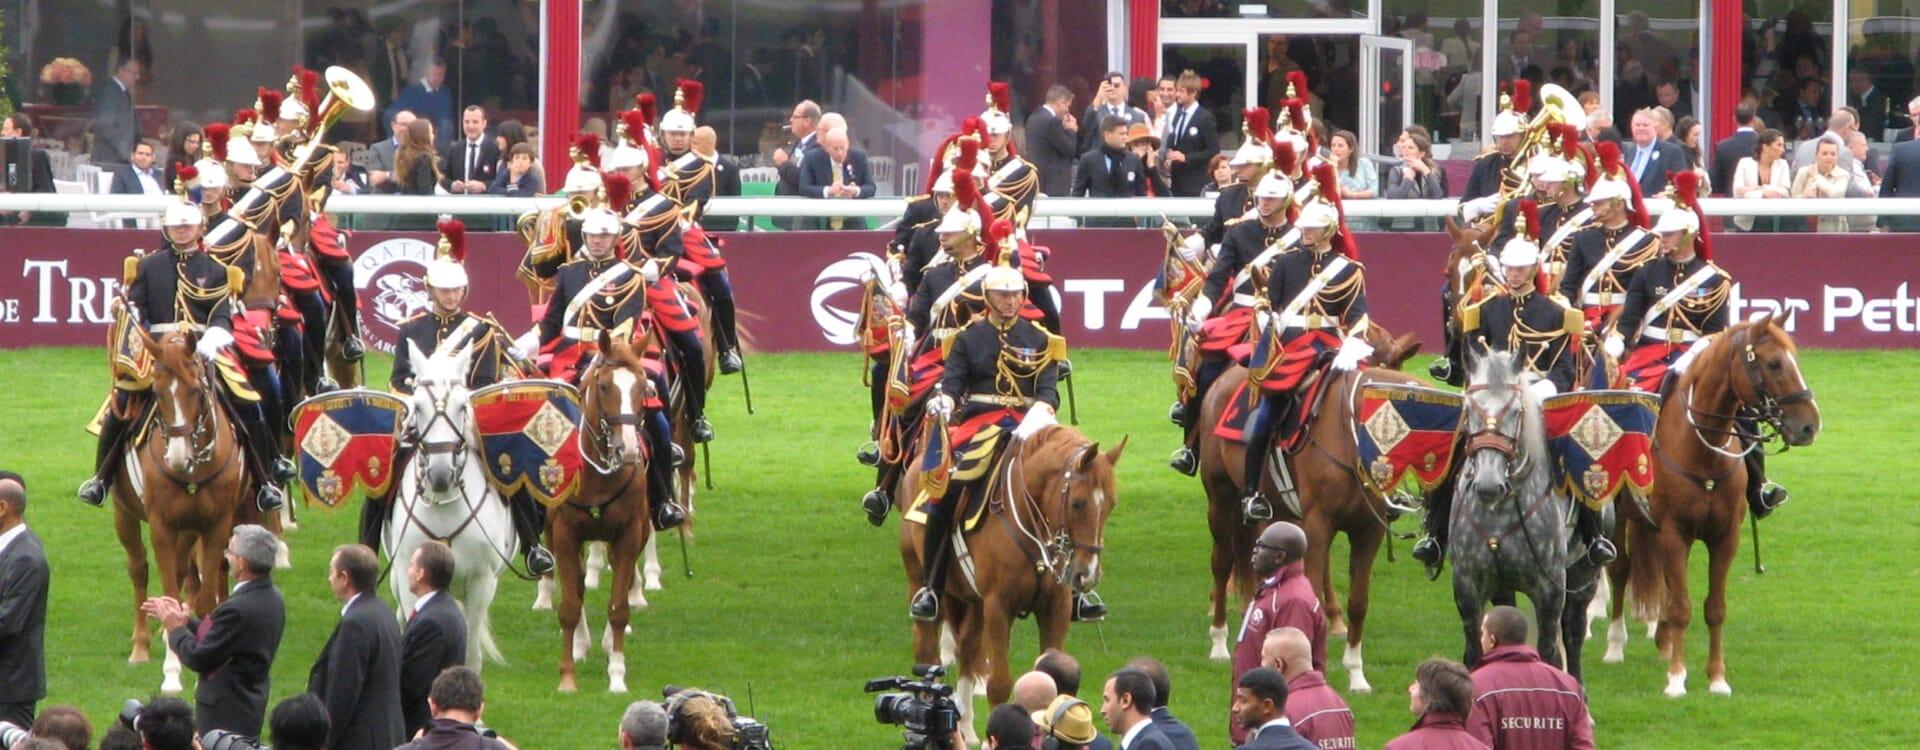 Qatar Prix De l'Arc De Triomphe Longchamp Racecourse hospitality Horse Racing Race Course VIP Corporate Sports VIP Hospitality